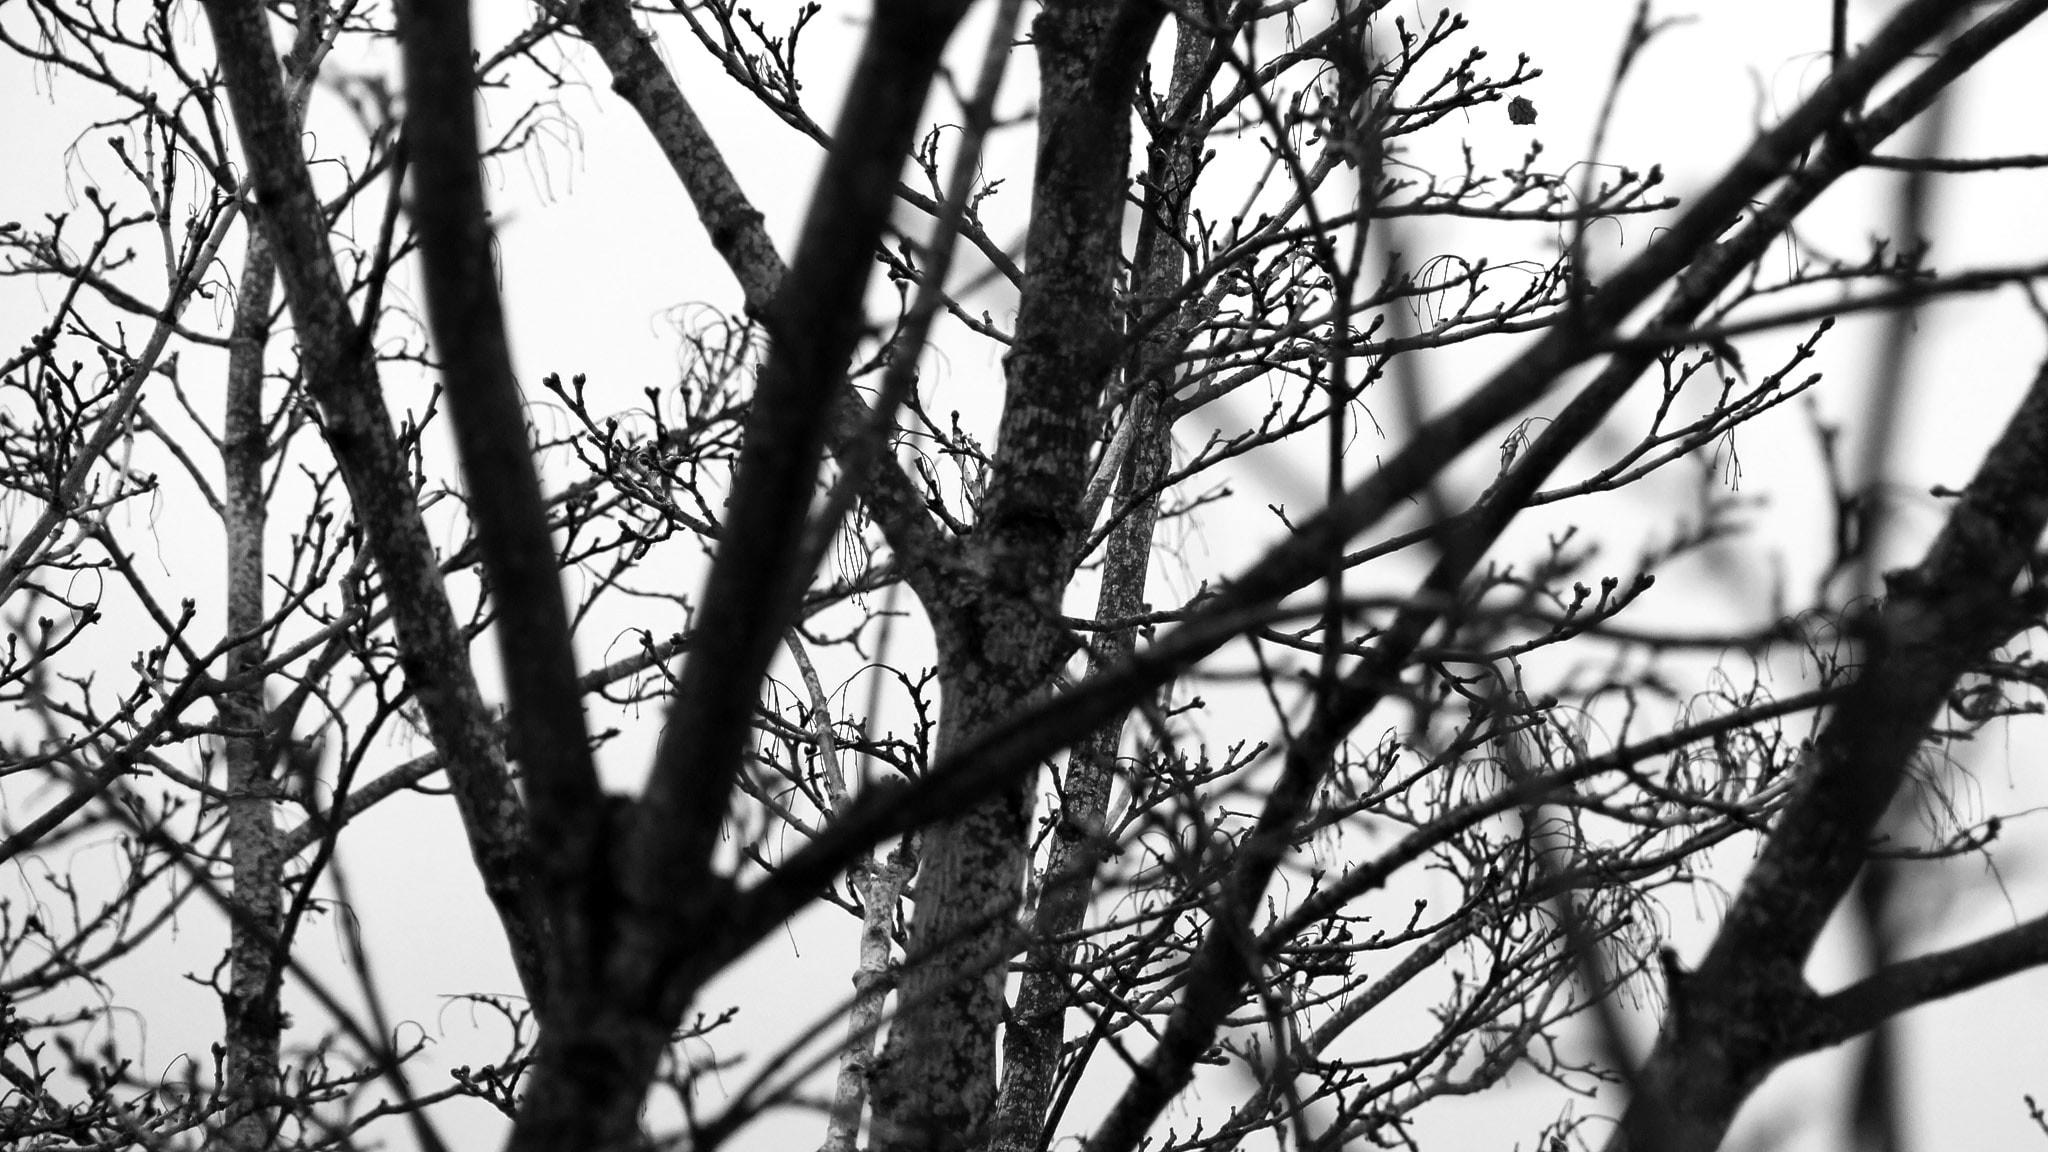 Kala träd. Foto: Lars-Gunnar Olsson/Sveriges Radio.